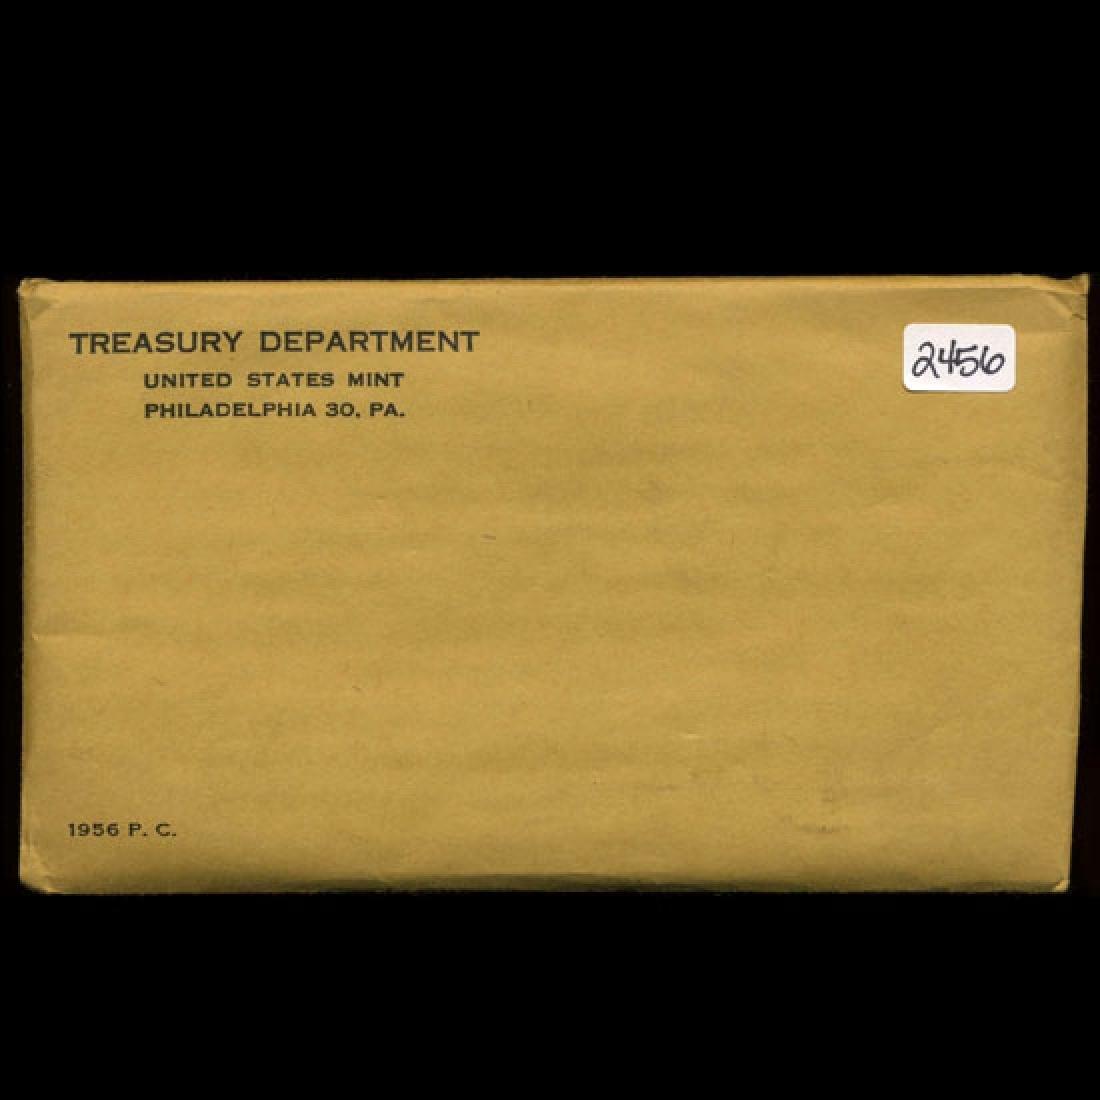 1956 Scarce Unopened Envelope Proof Set